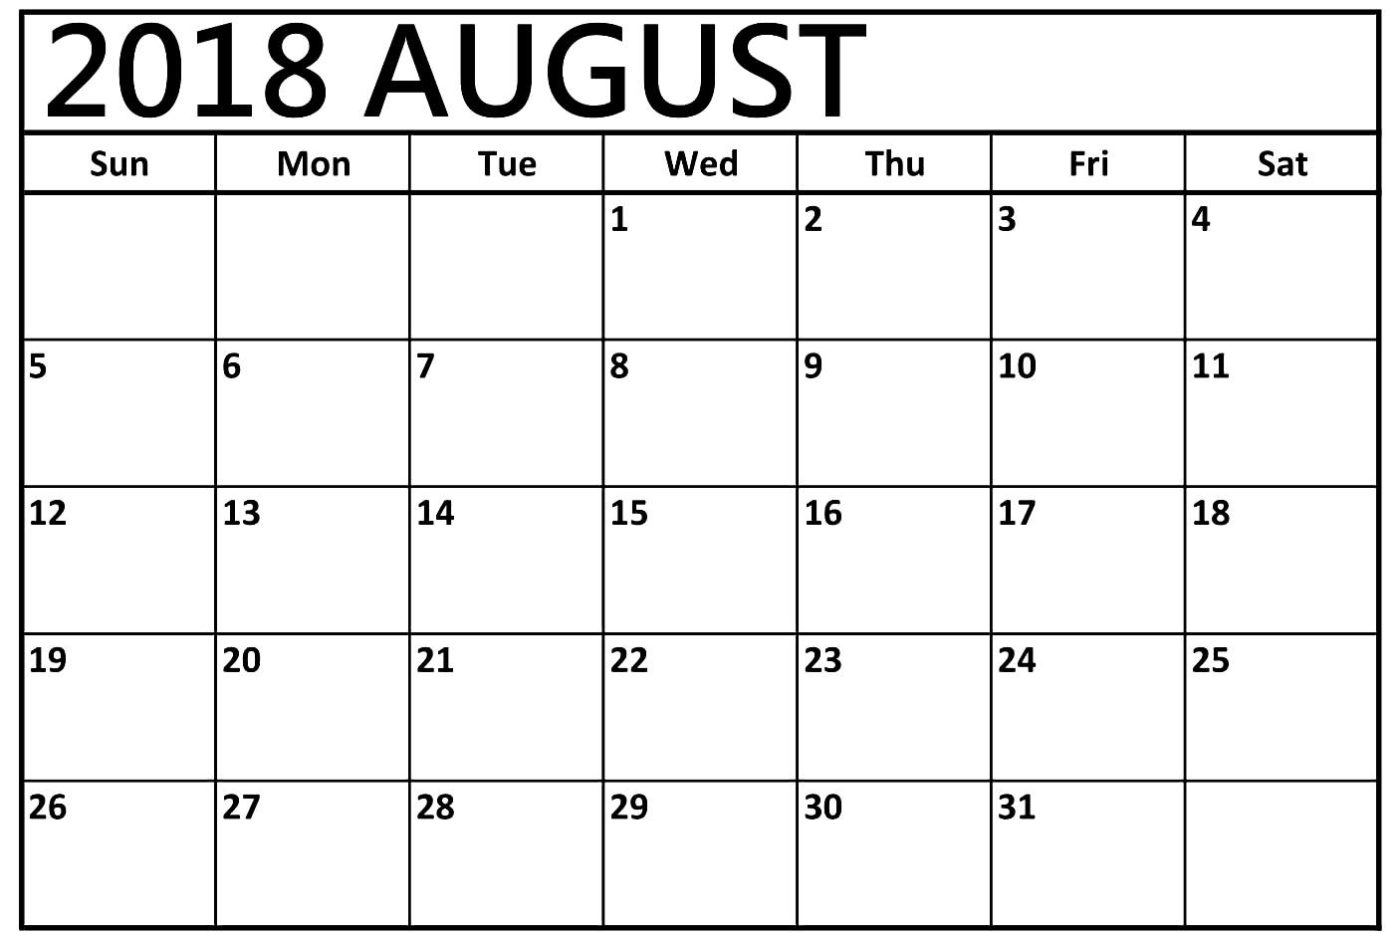 august 2018 editable calendar template download public holidays Free Pretty Printable Calendars August 2018 erdferdf